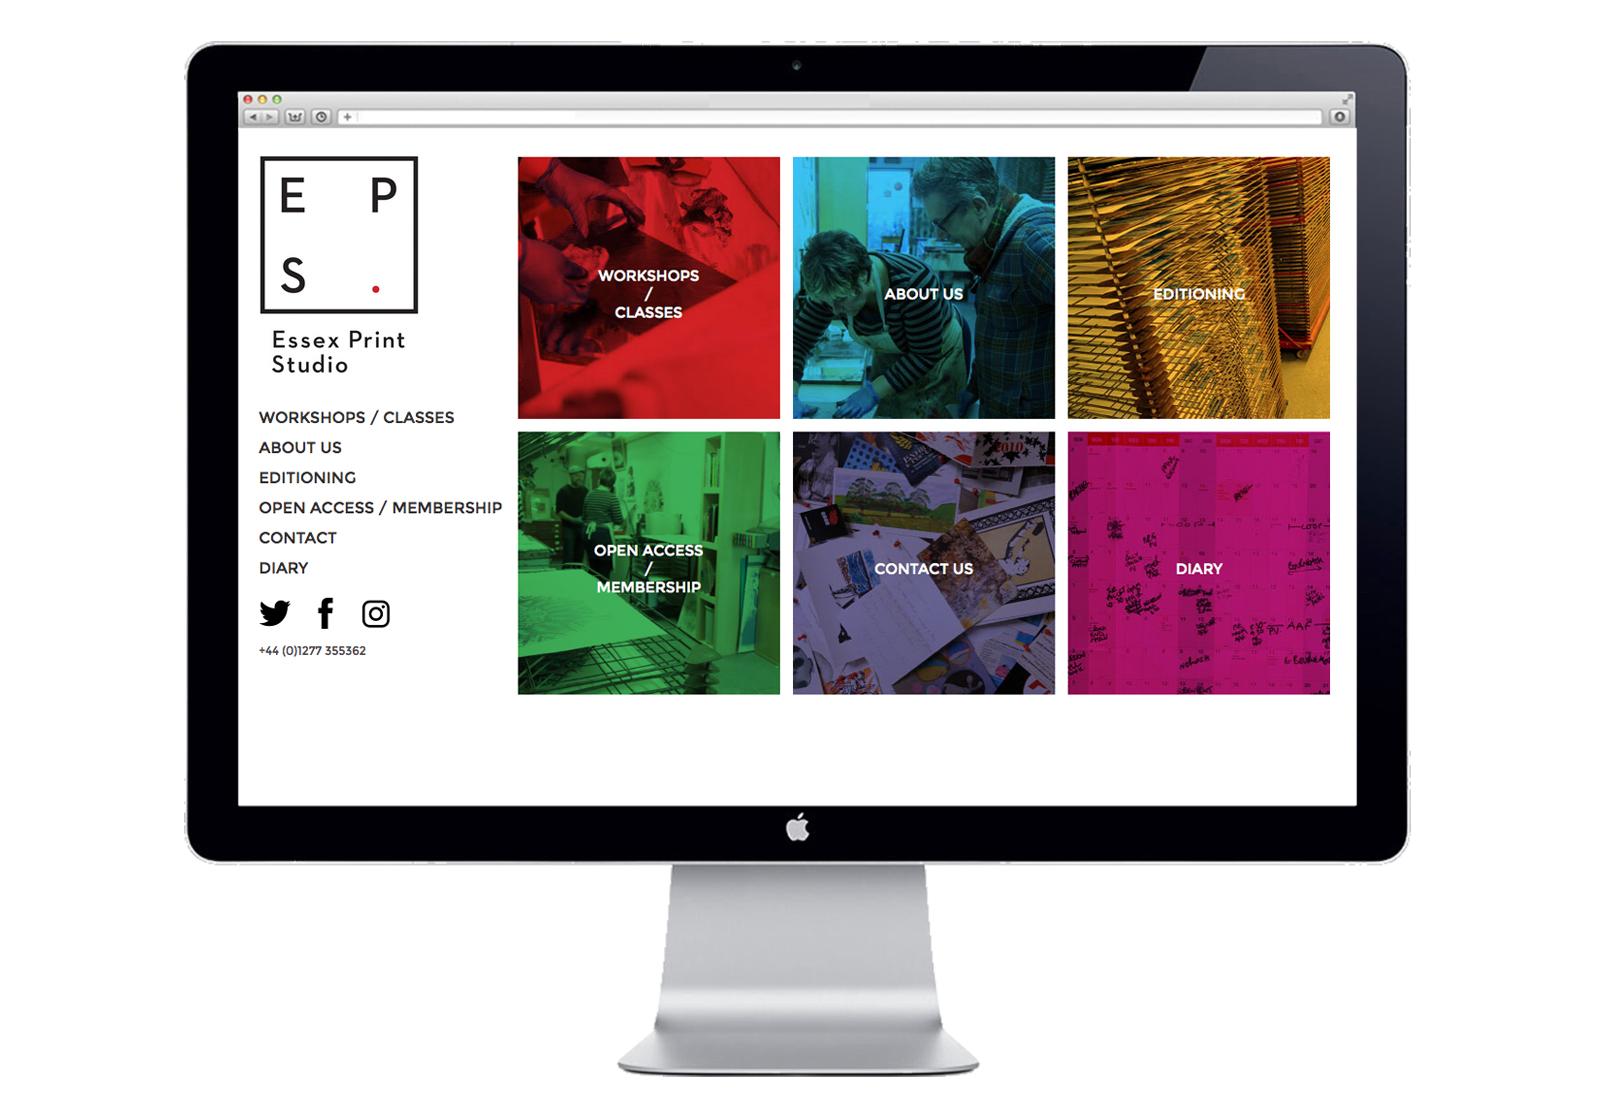 Form.uk.com_EPS_web1